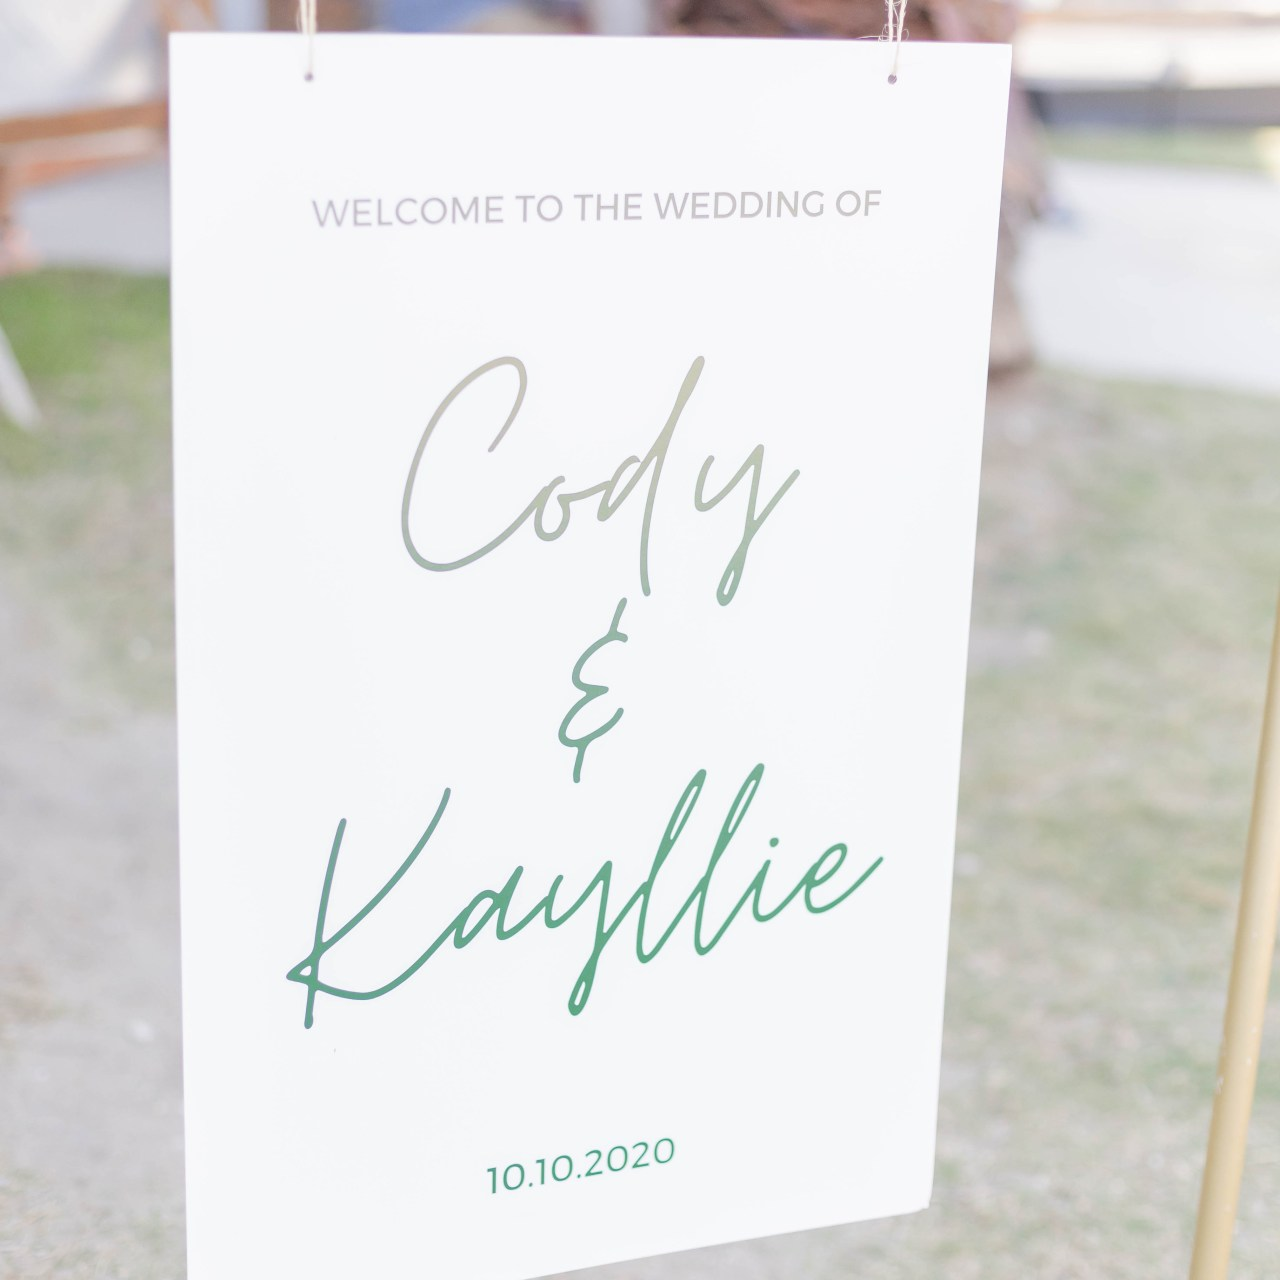 DIY Wedding Welcome Sign (so easy!)